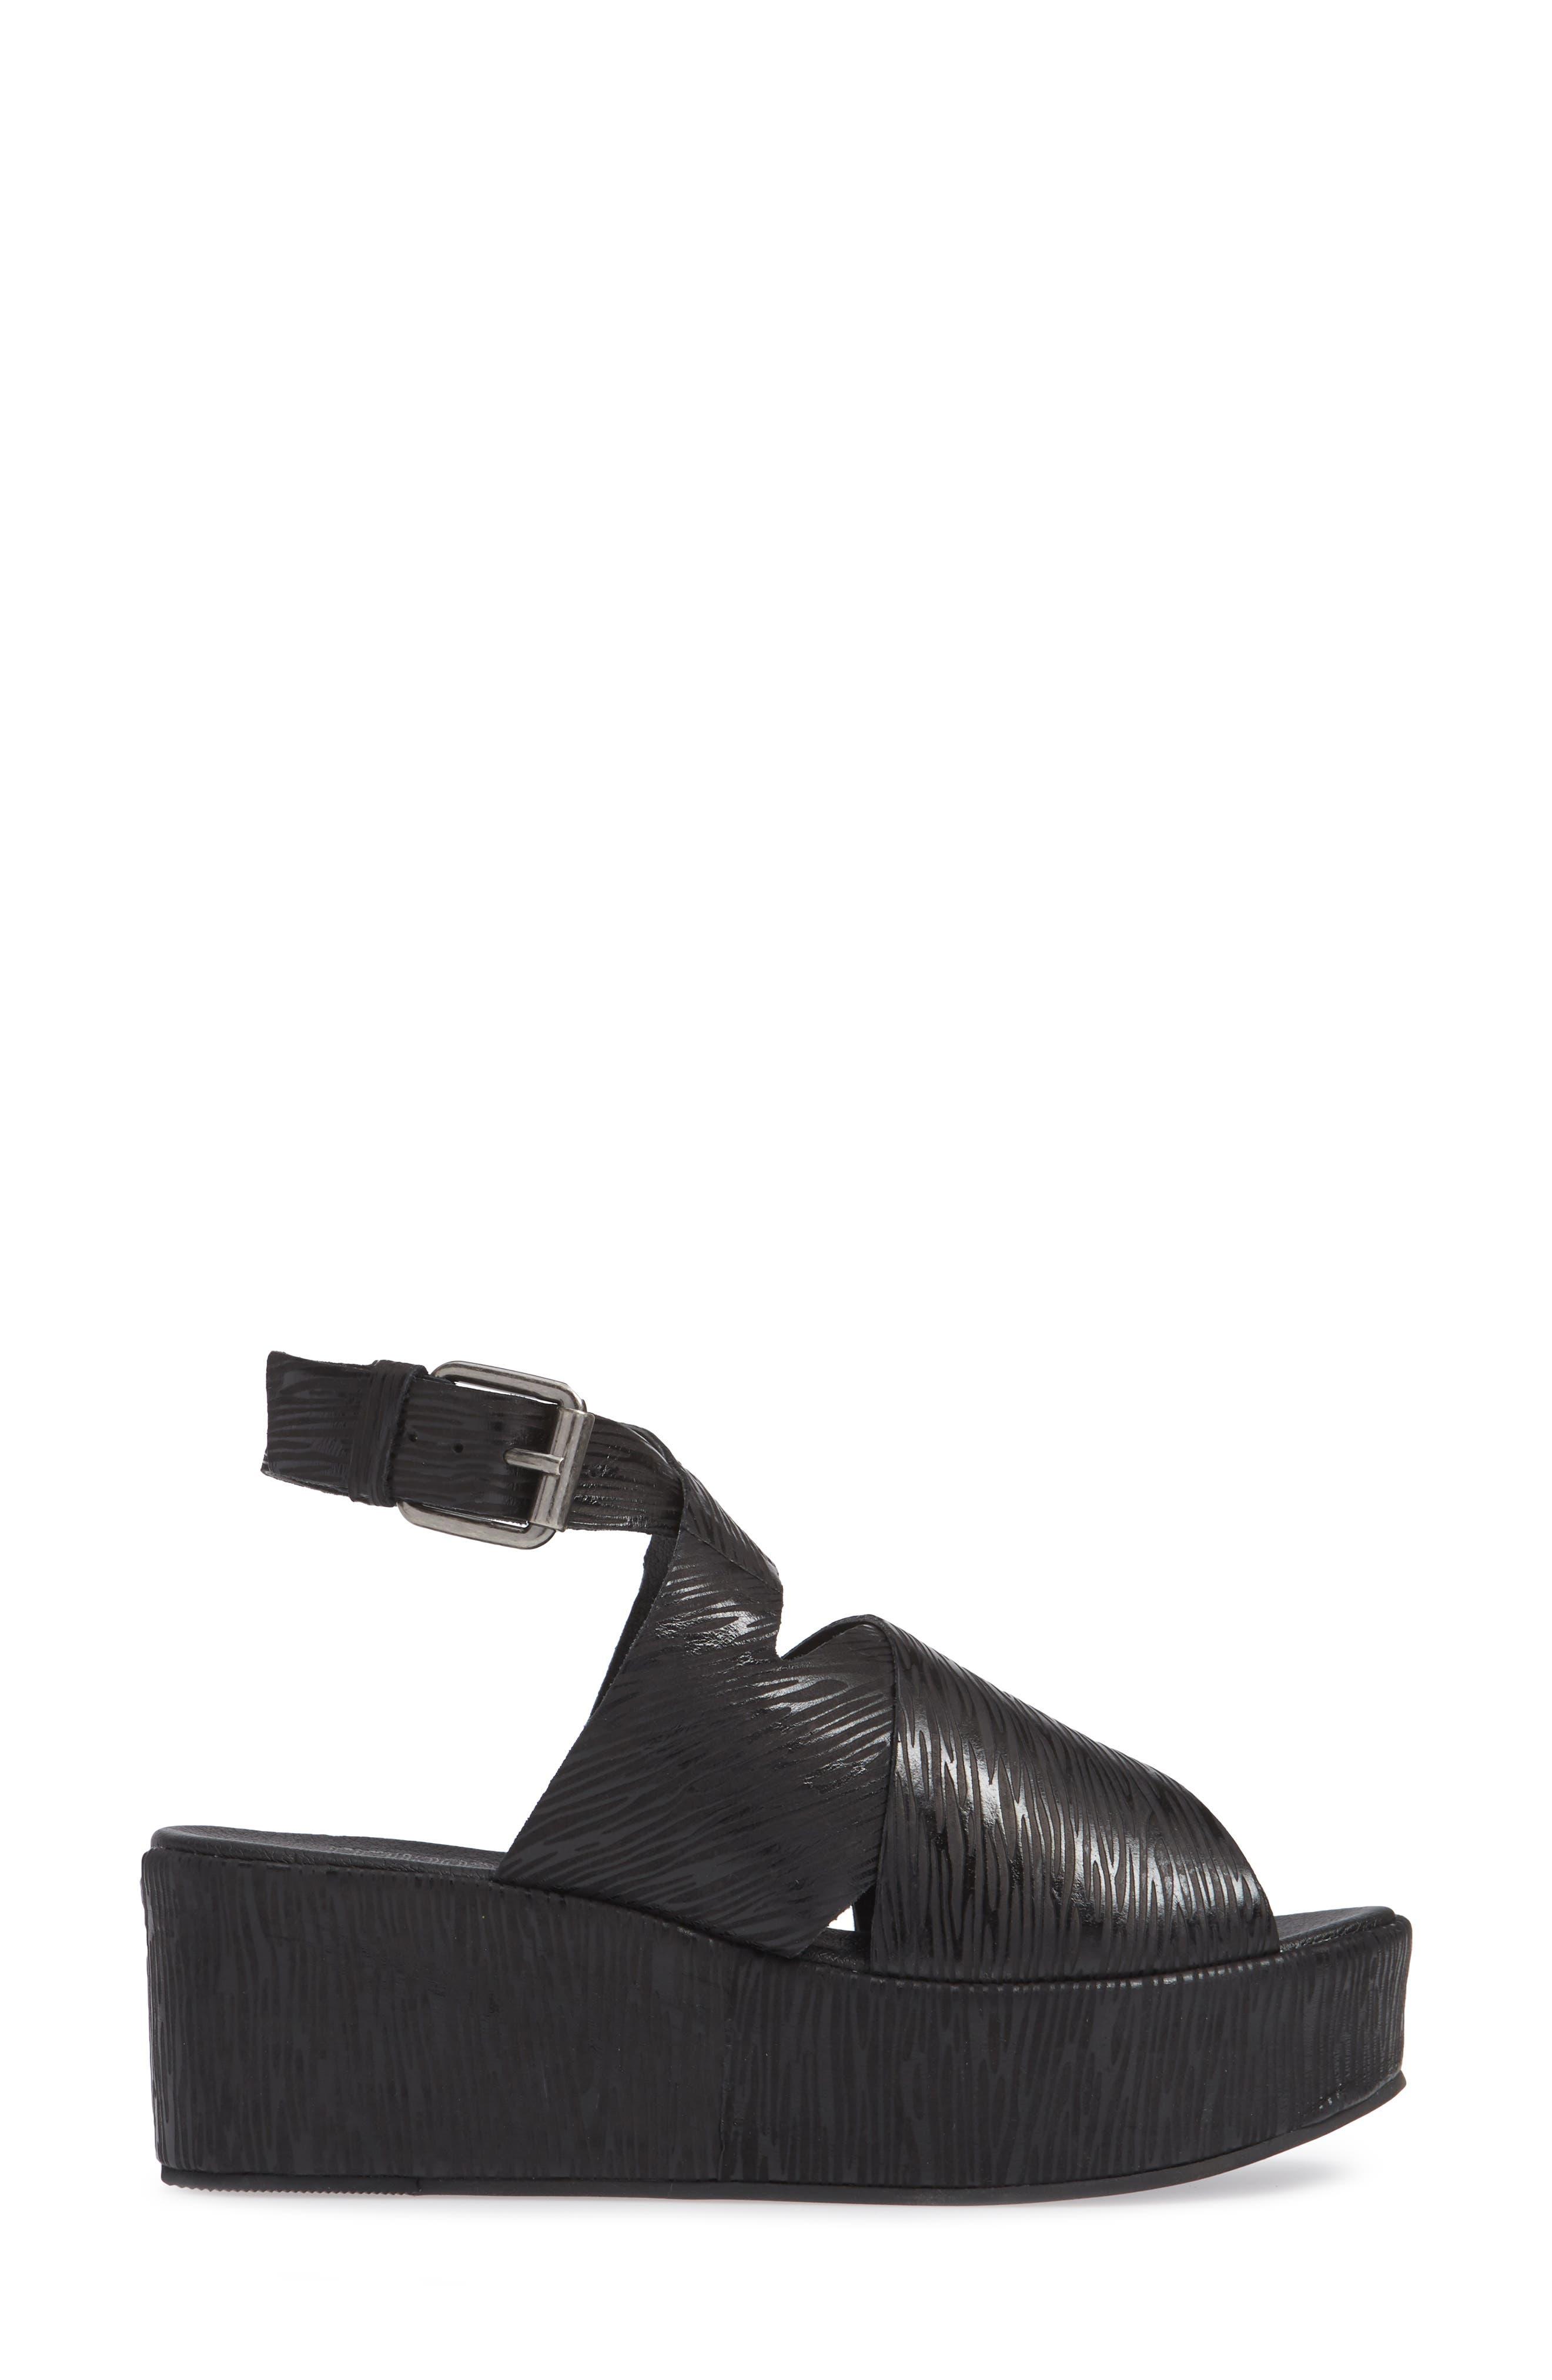 Runway Wedge Sandal,                             Alternate thumbnail 4, color,                             Black Lizard Print Leather